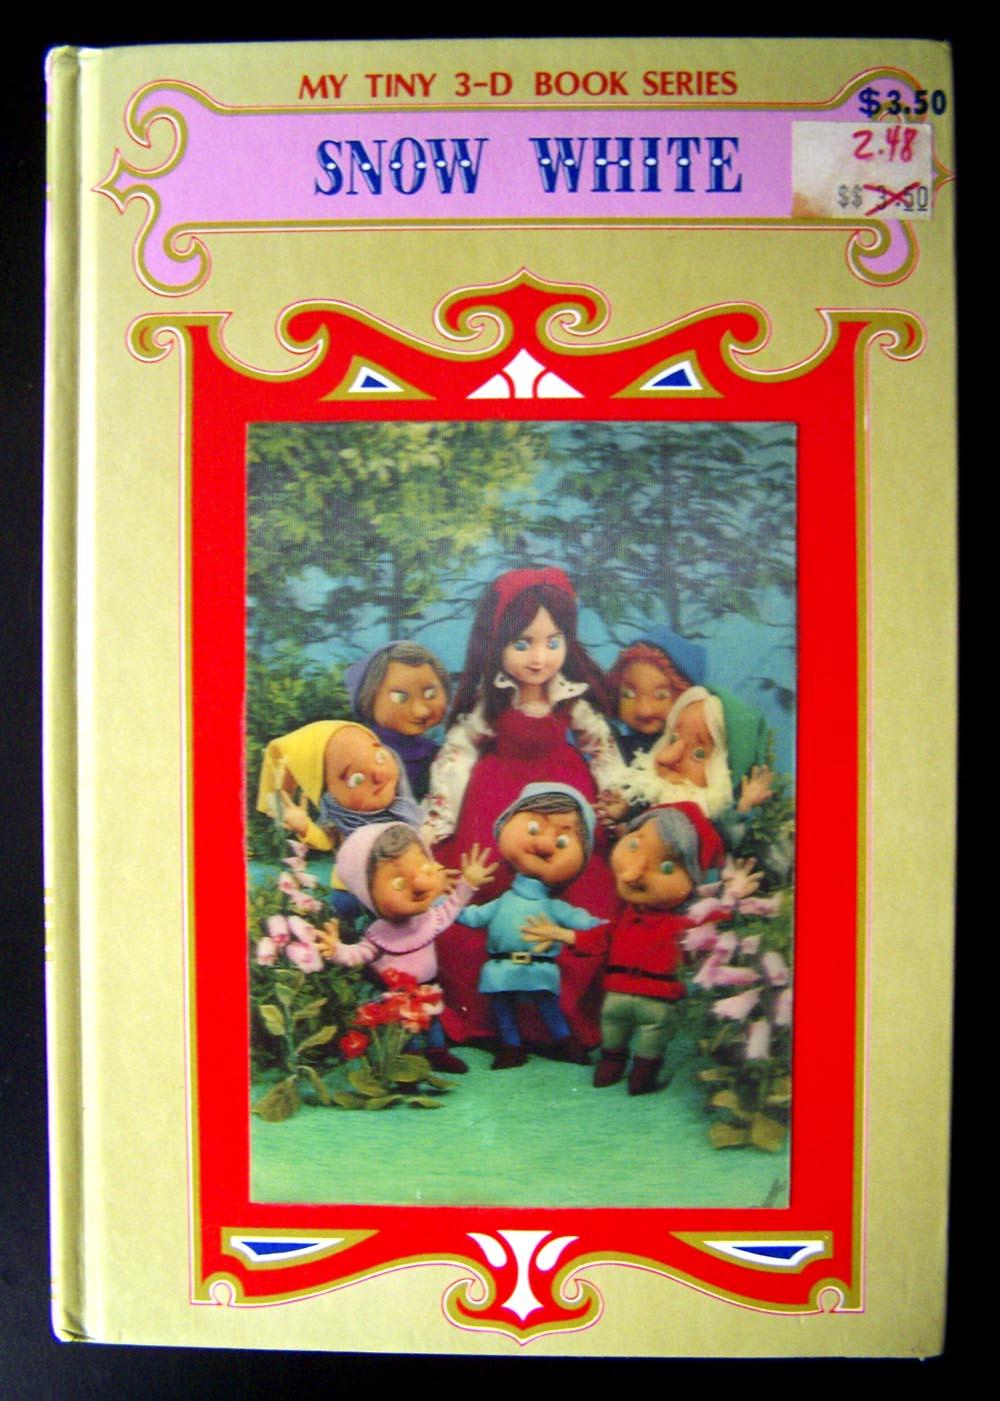 Book Cover Of Snow White : Moonkitten s timeline